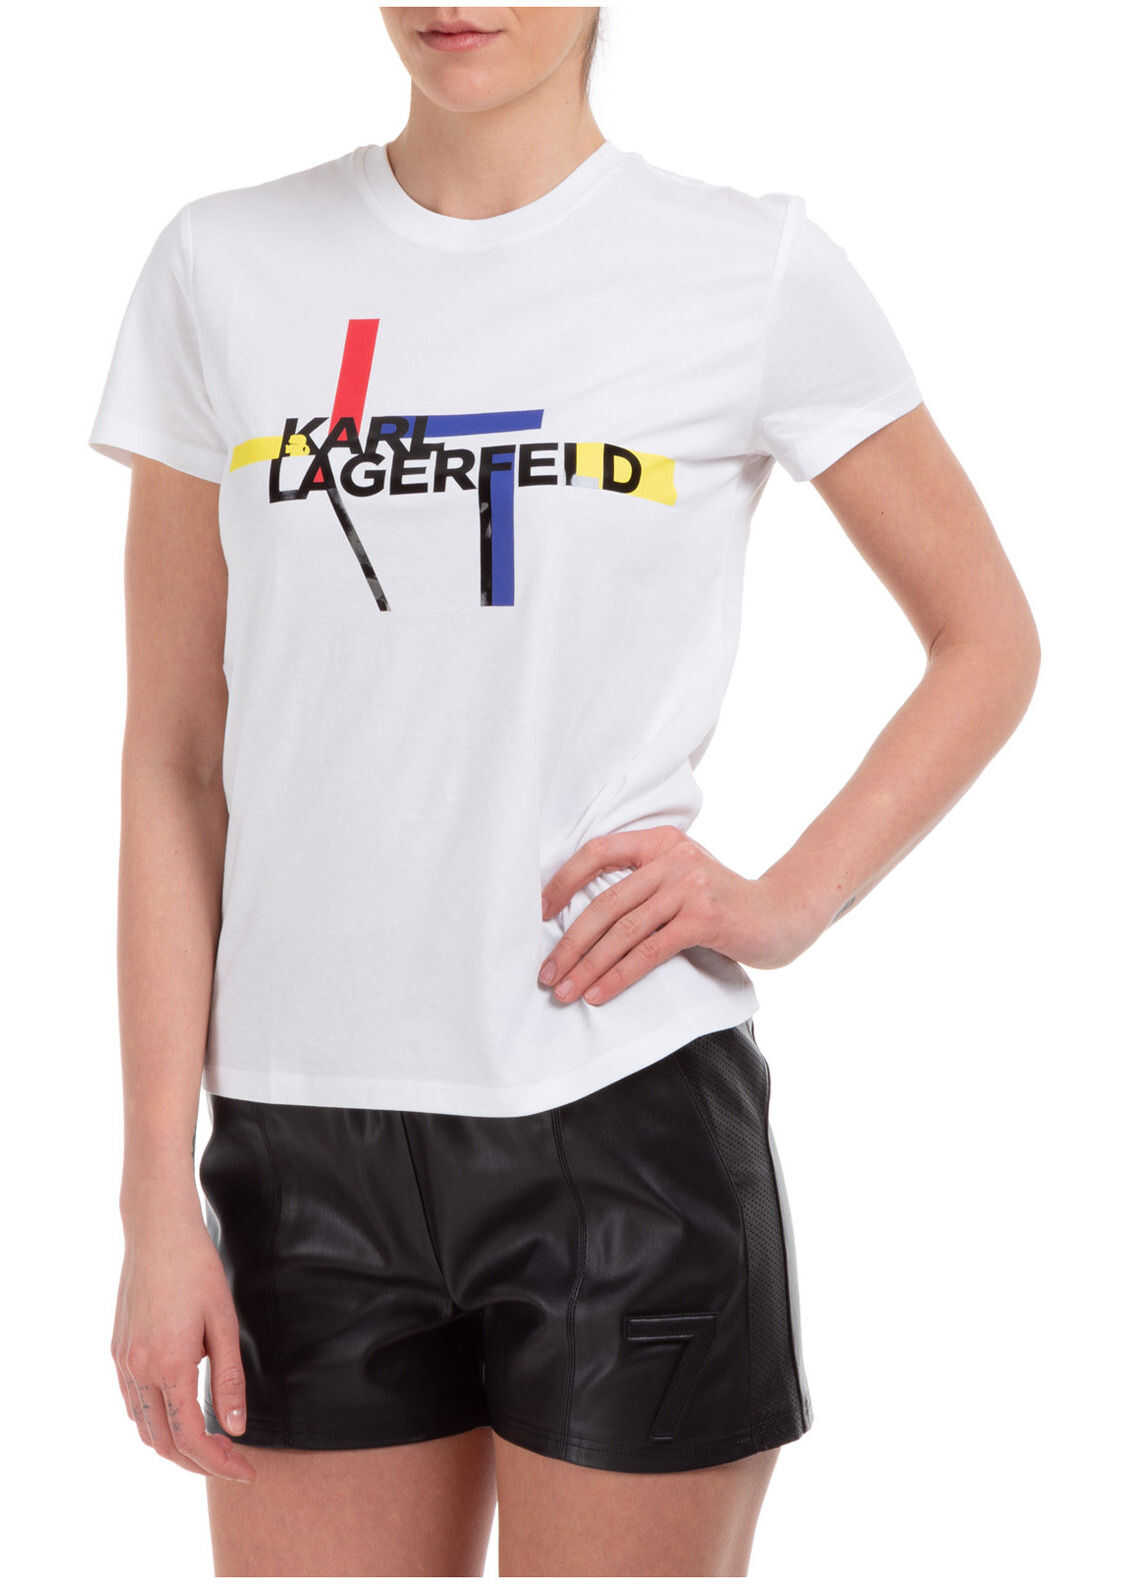 Karl Lagerfeld Round Bauhaus White